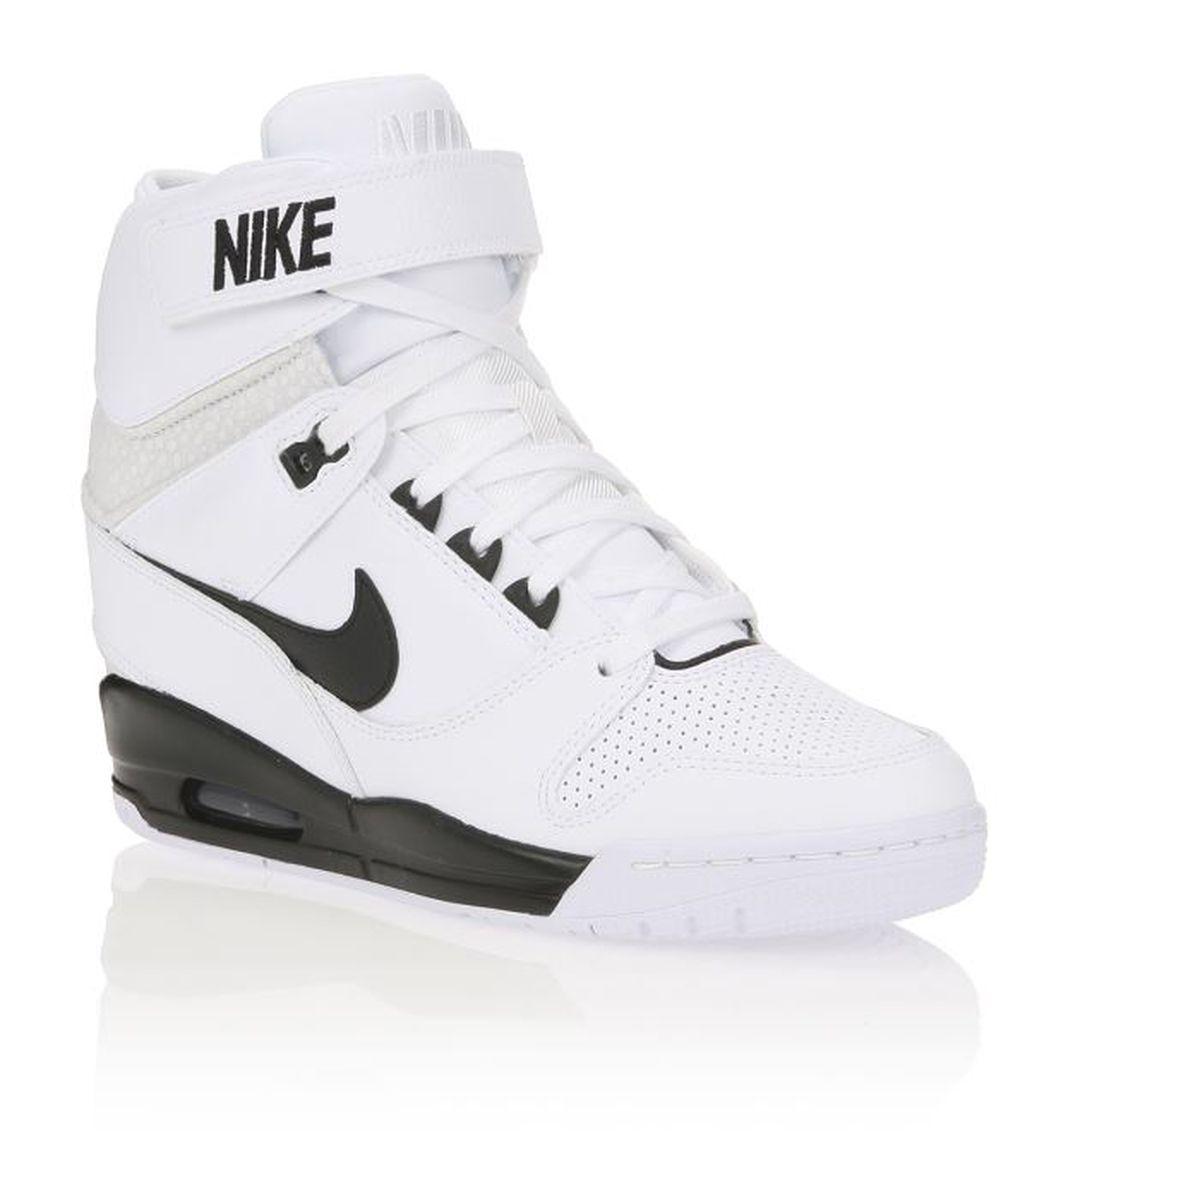 Noir Sky Femme Nike Blanc Vente Revolution Hi Et Baskets Achat zMVSUp